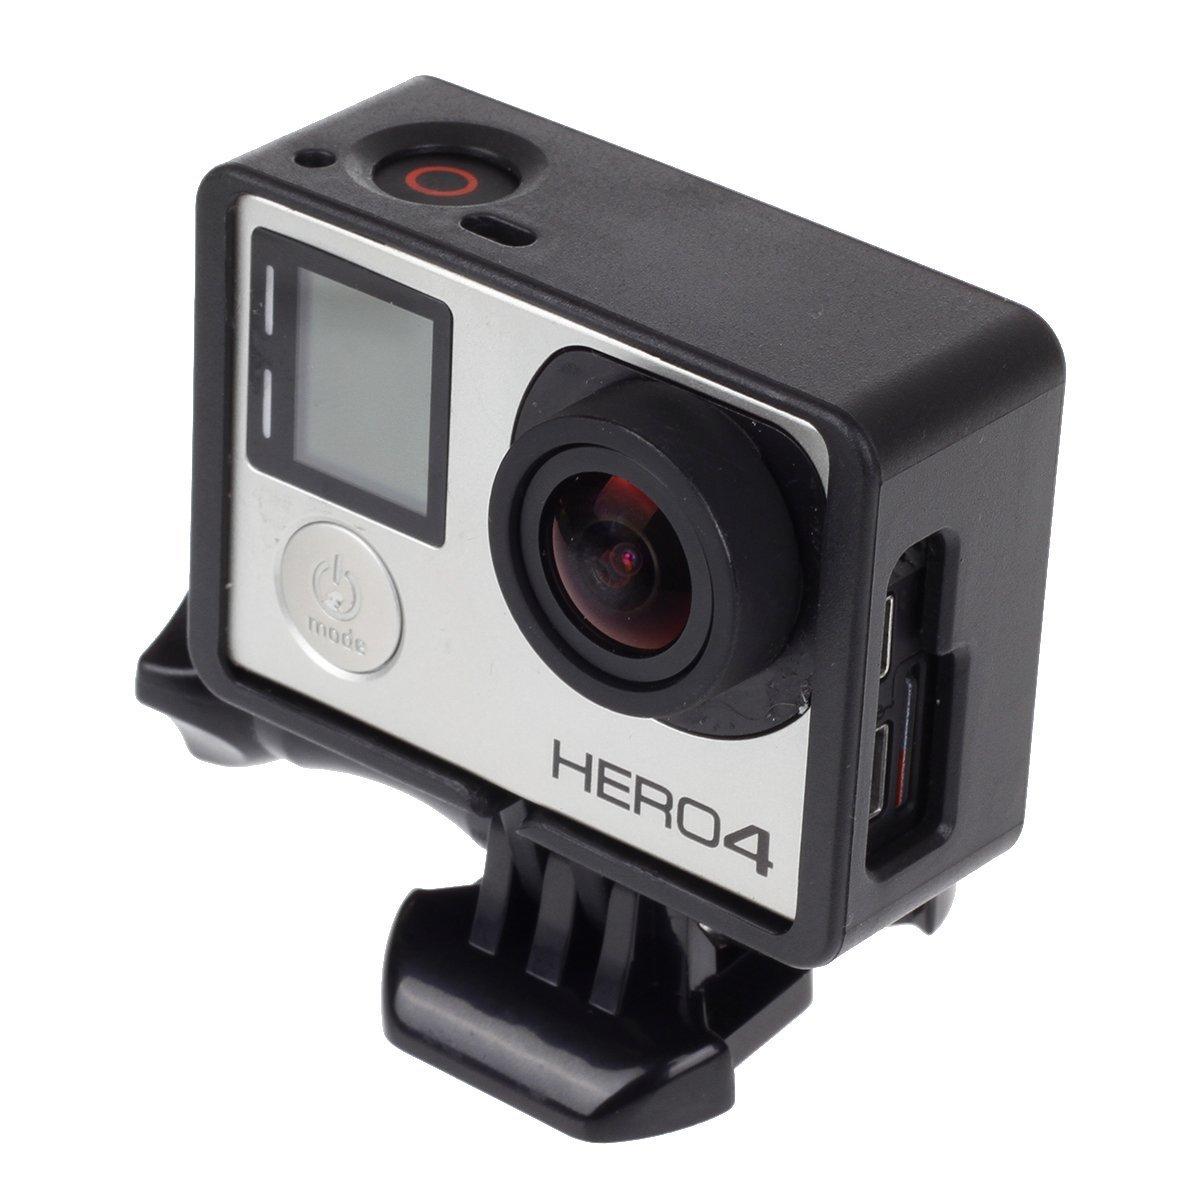 Greencherryフレームマウント保護ハウジングケースfor GoPro Hero 4、Hero 3 +カメラ   B0775RR928